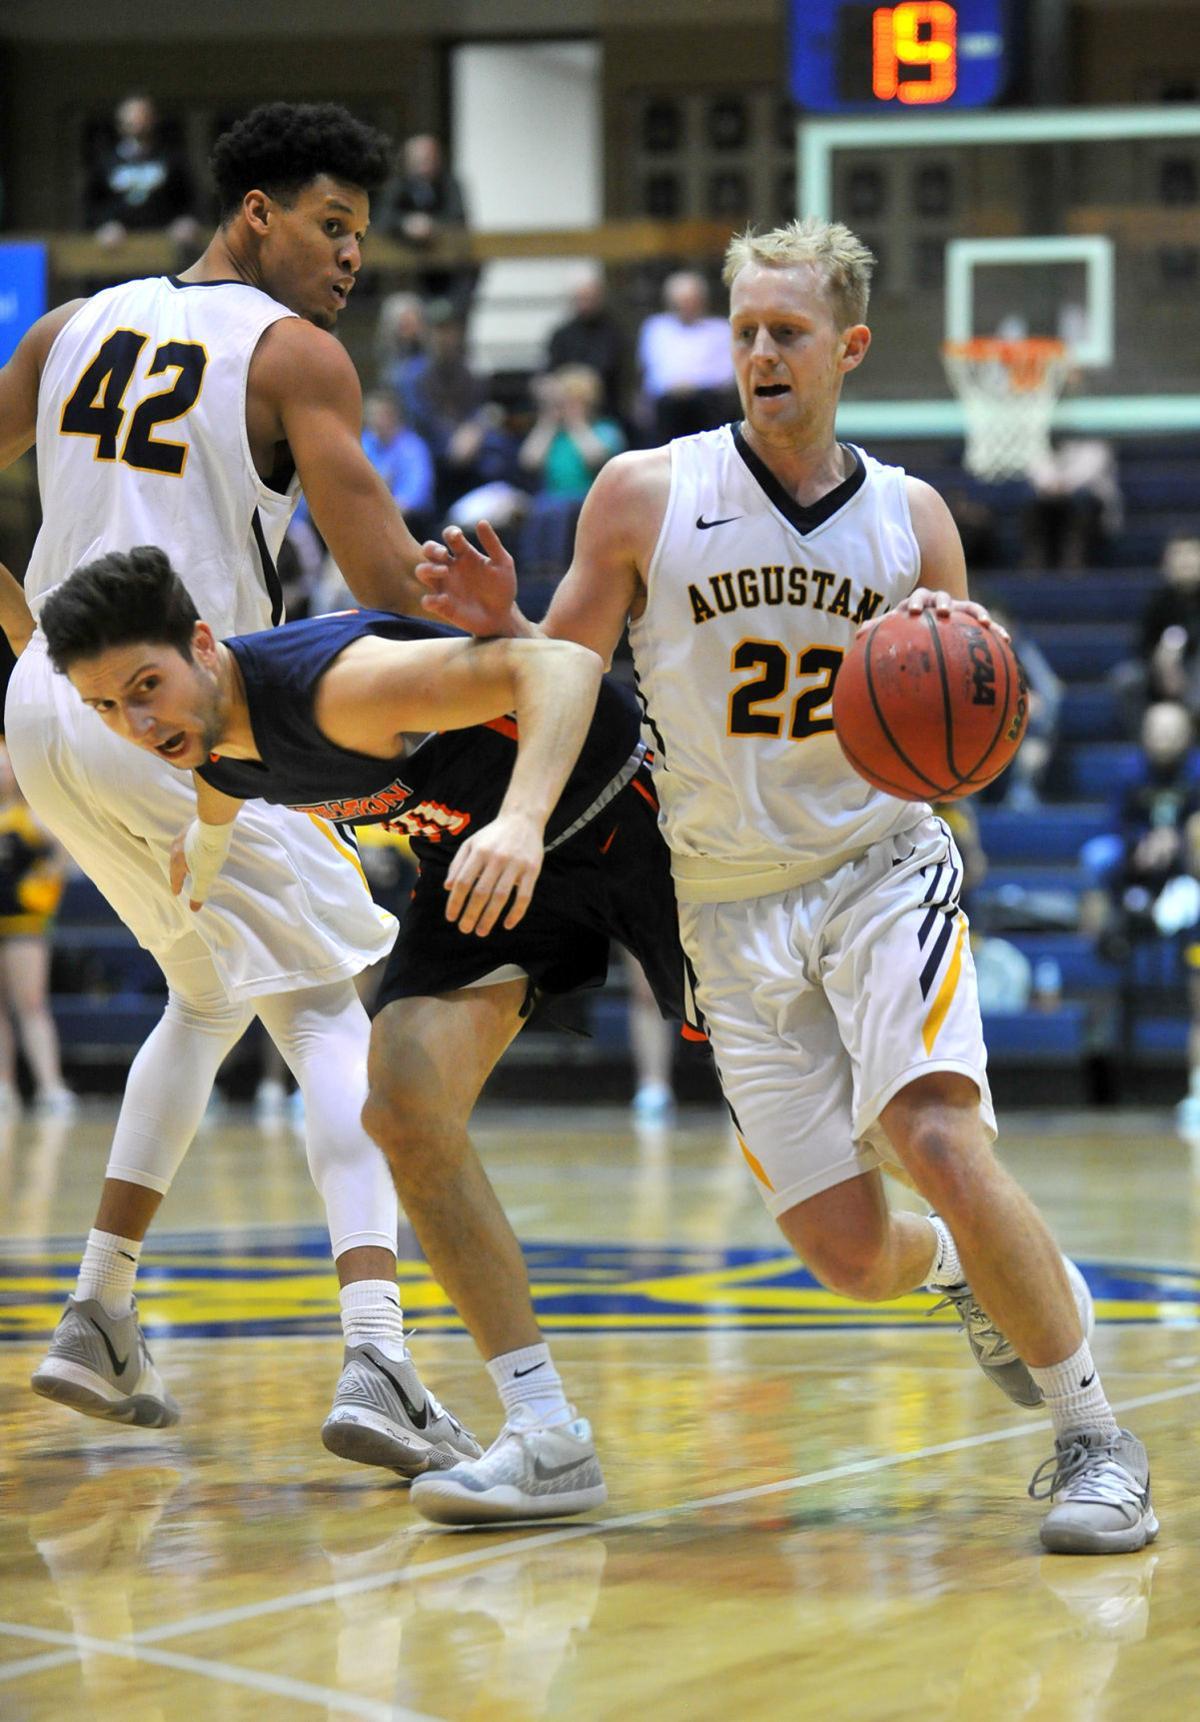 Augustana vs Wheaton men's basketball